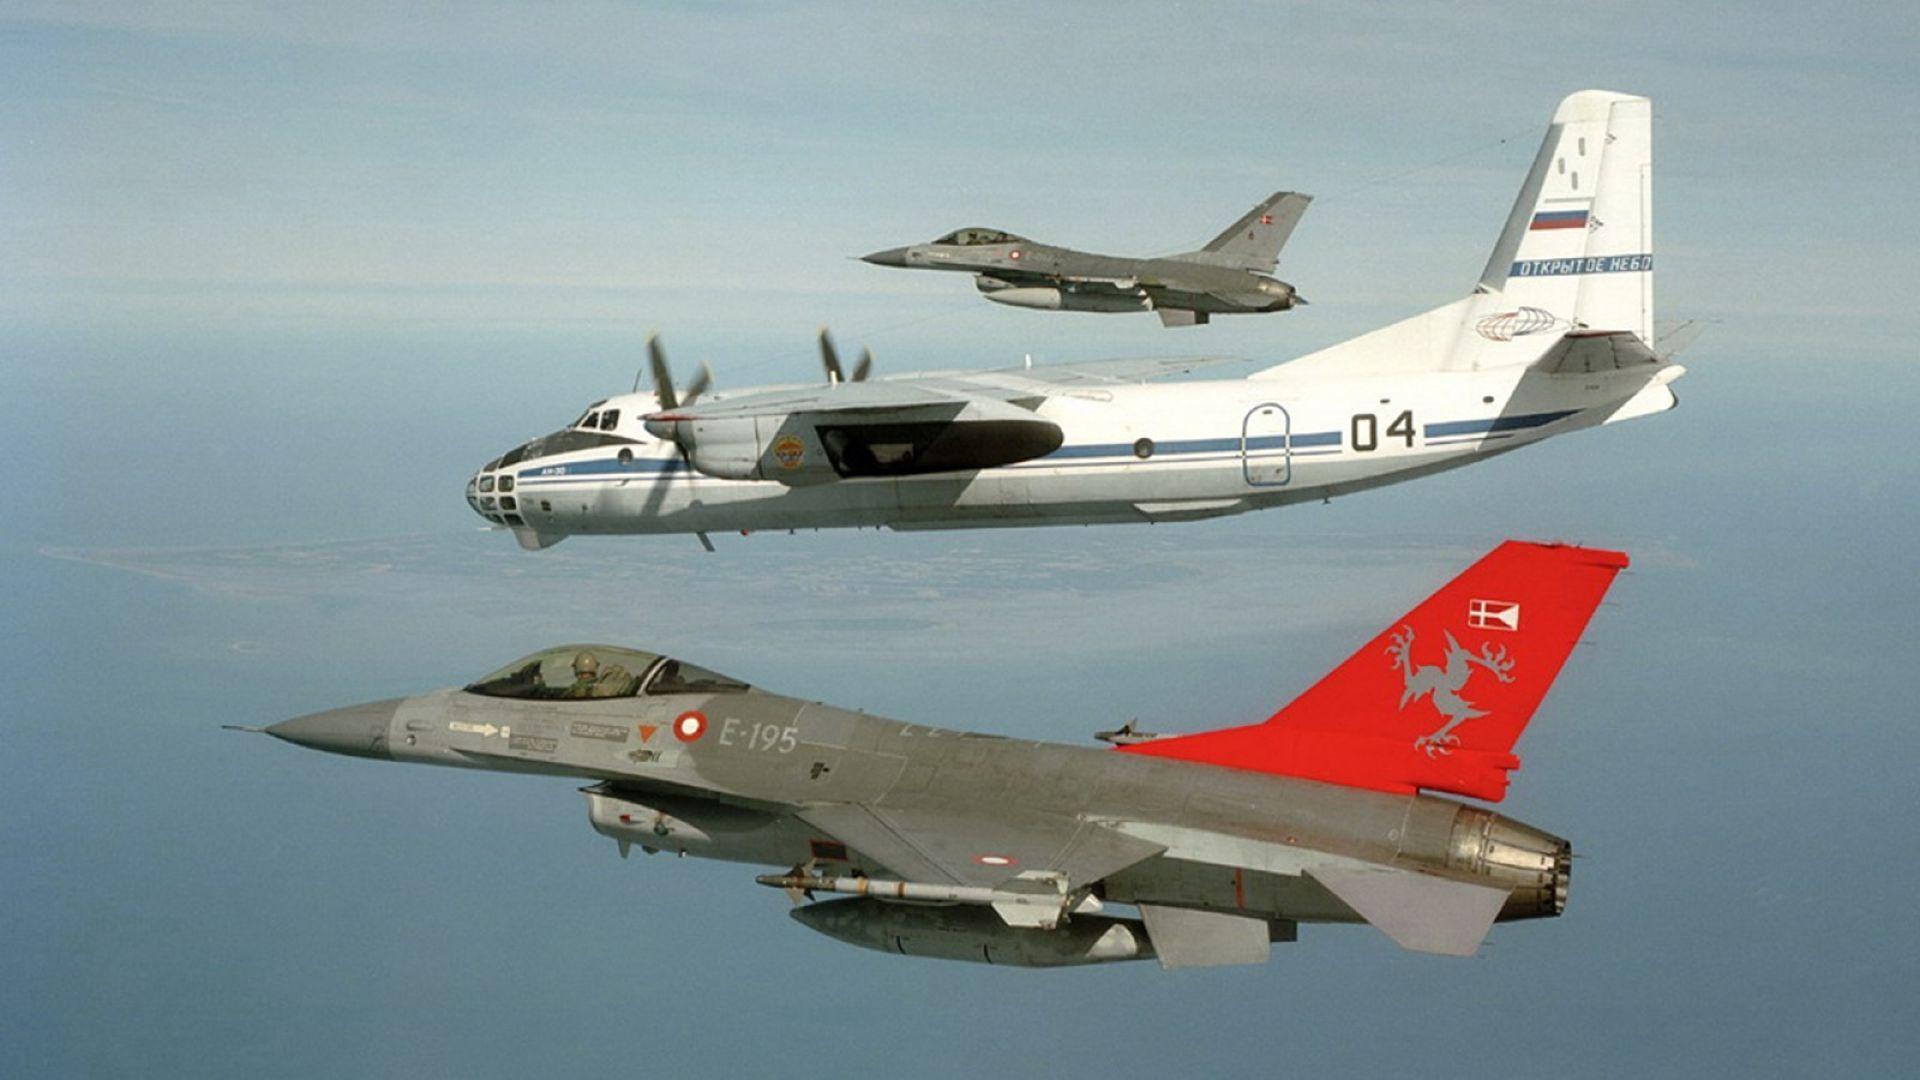 Russia Says Us Making Unacceptable Demands On Open Skies Treaty Nato Openskiestreaty Russia Treaty In 2020 Open Sky Military Russia